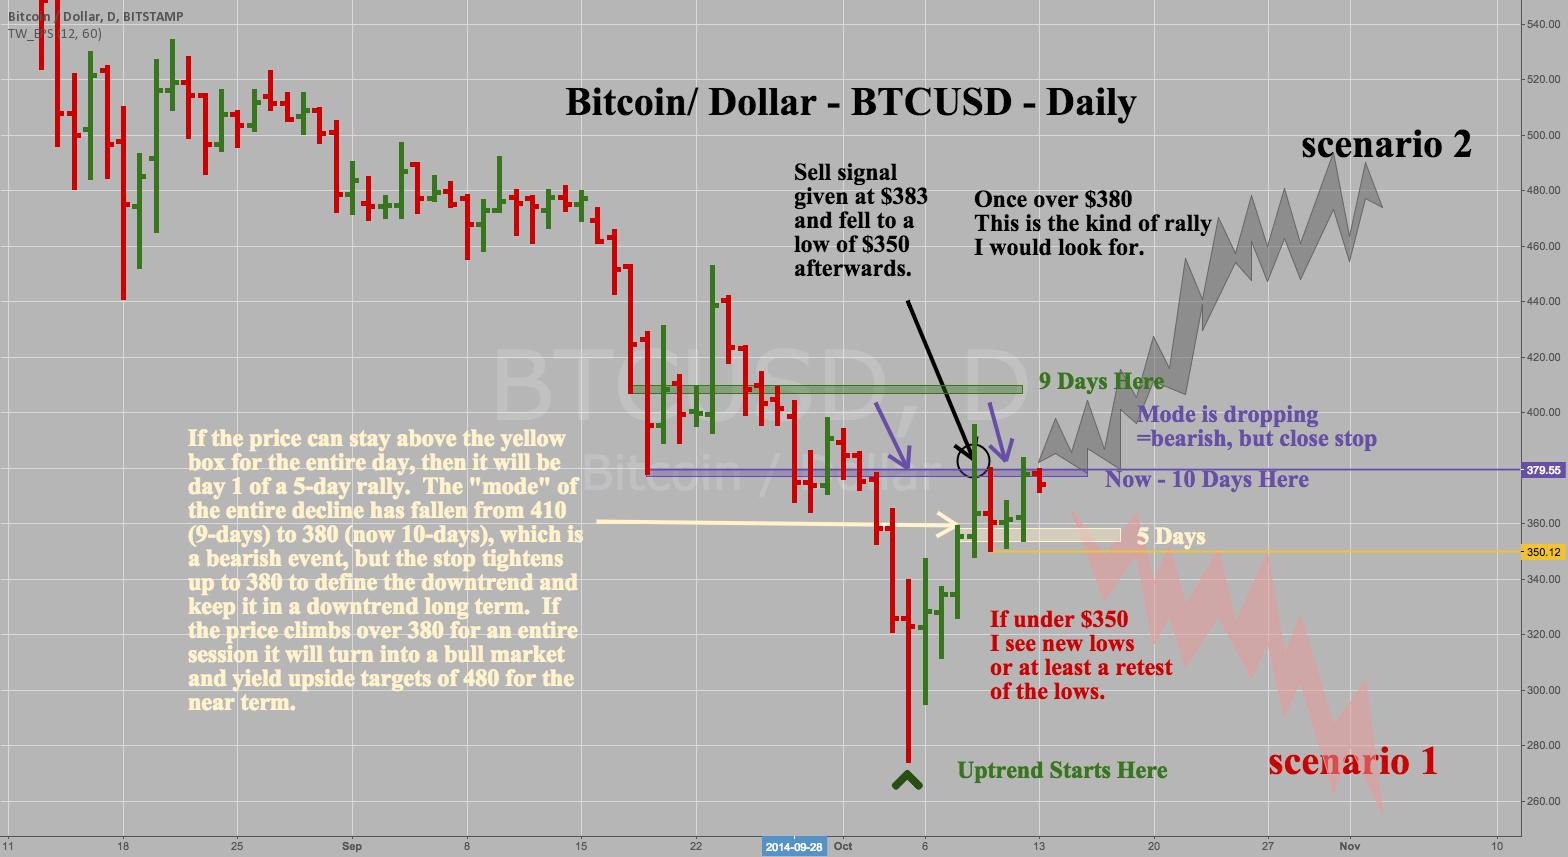 Bitcoin /Dollar - BTCUSD -Daily - Two Scenarios from here $375